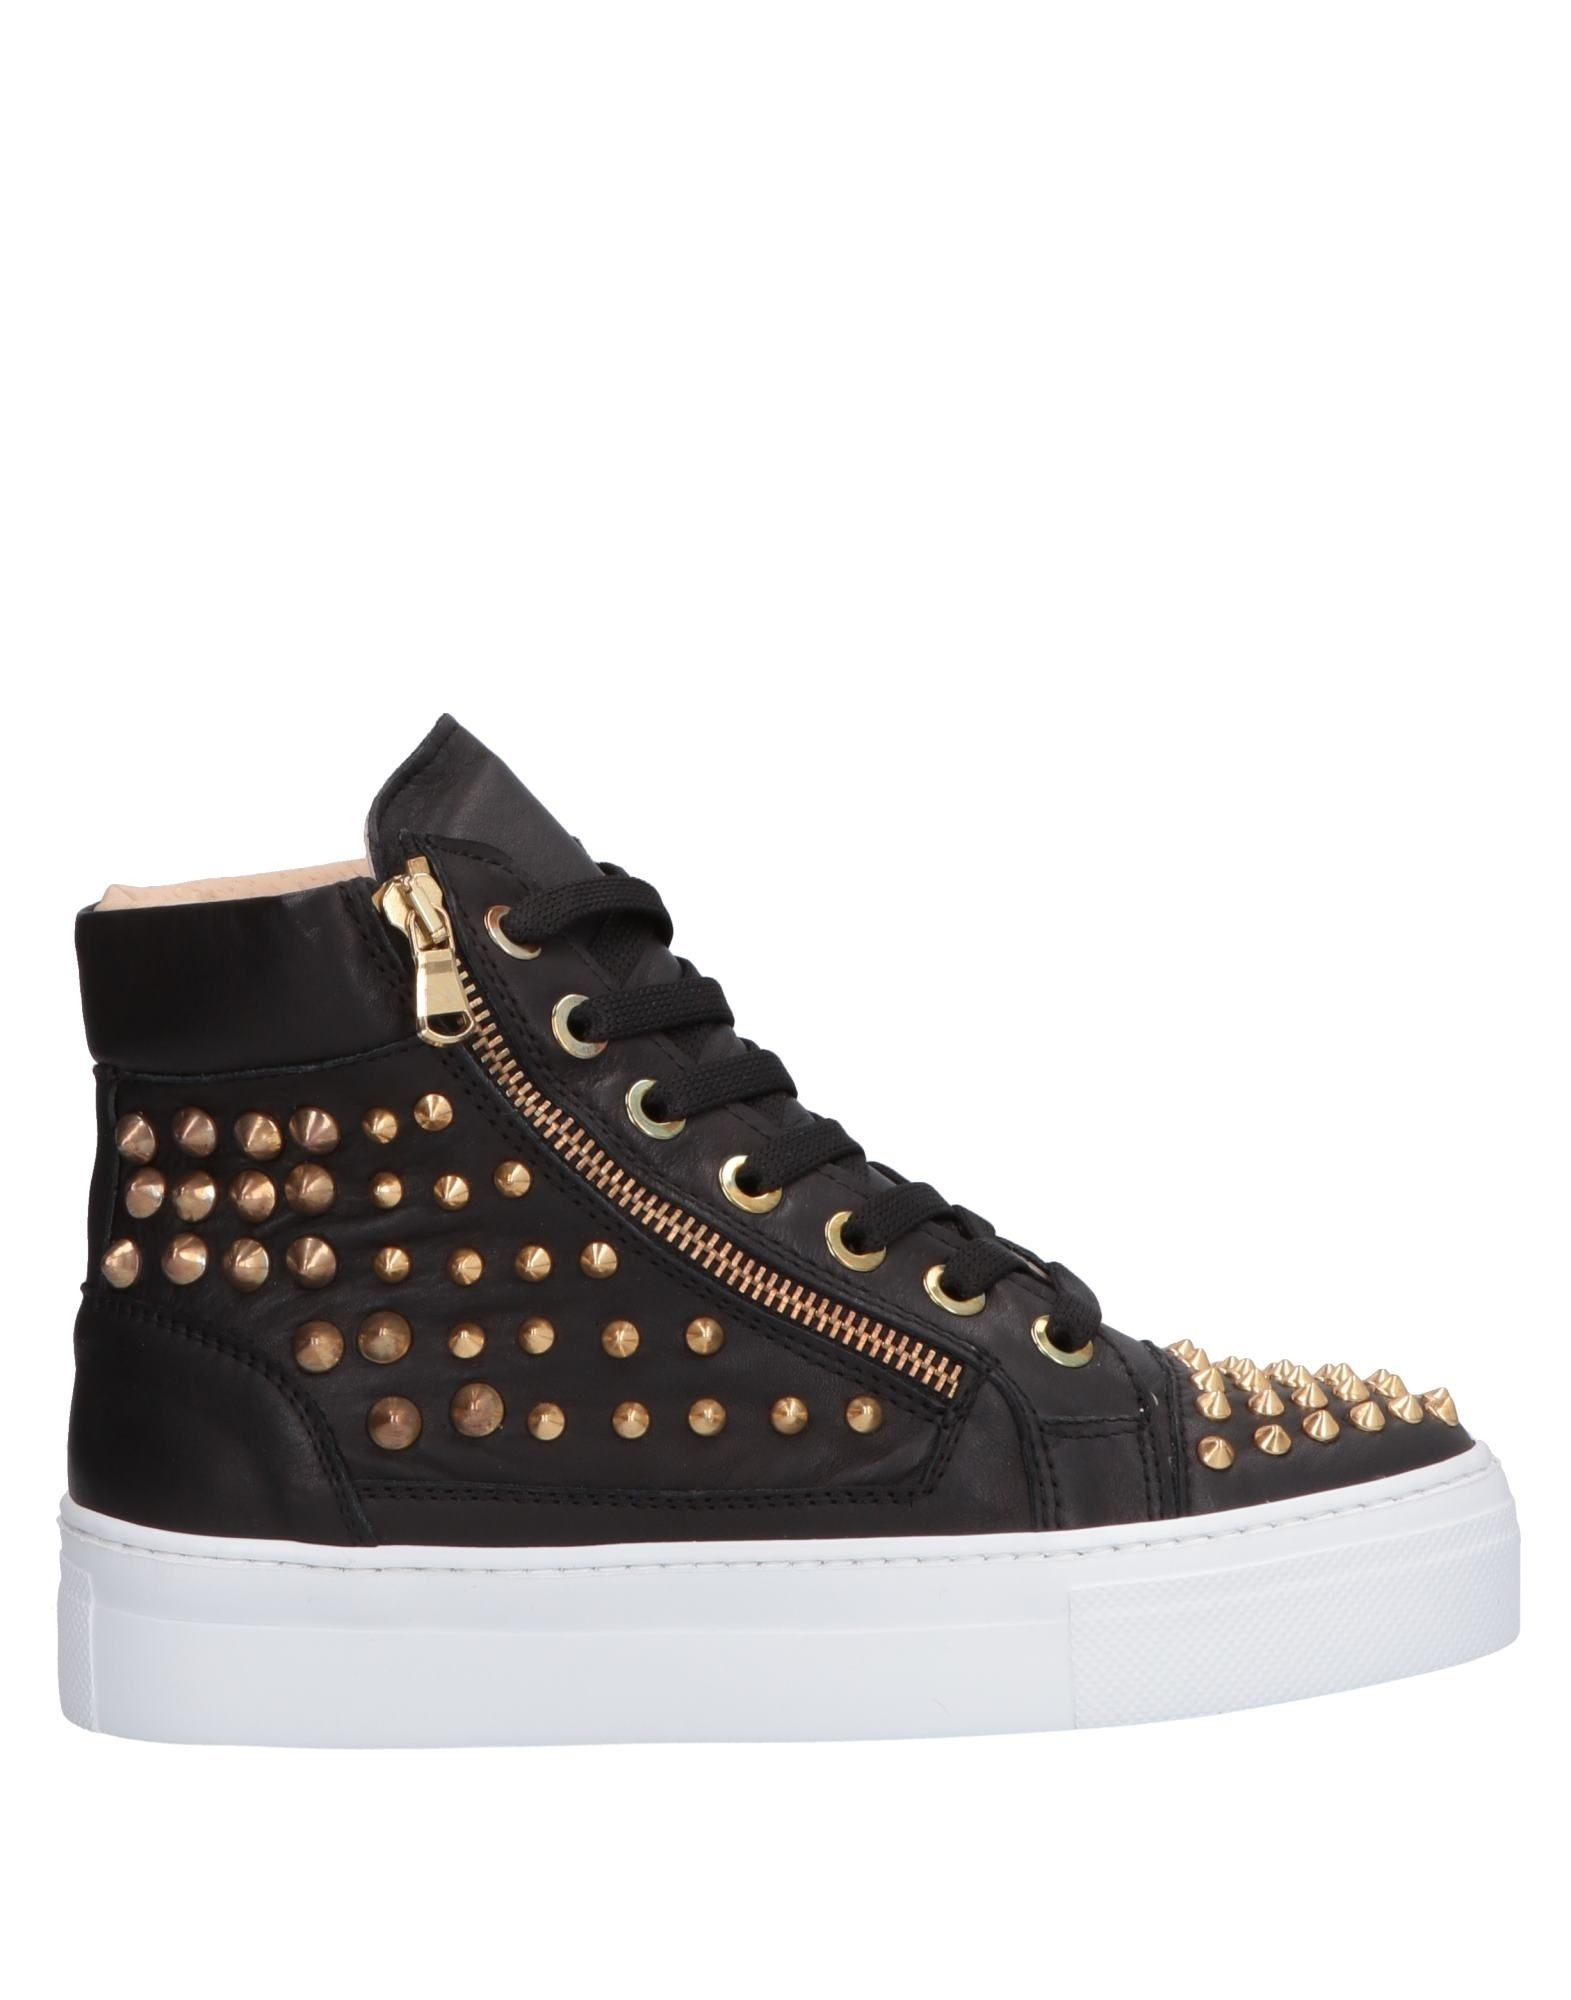 Spaziomoda Sneakers online - Women Spaziomoda Sneakers online Sneakers on  Australia - 11573356GS 947d44